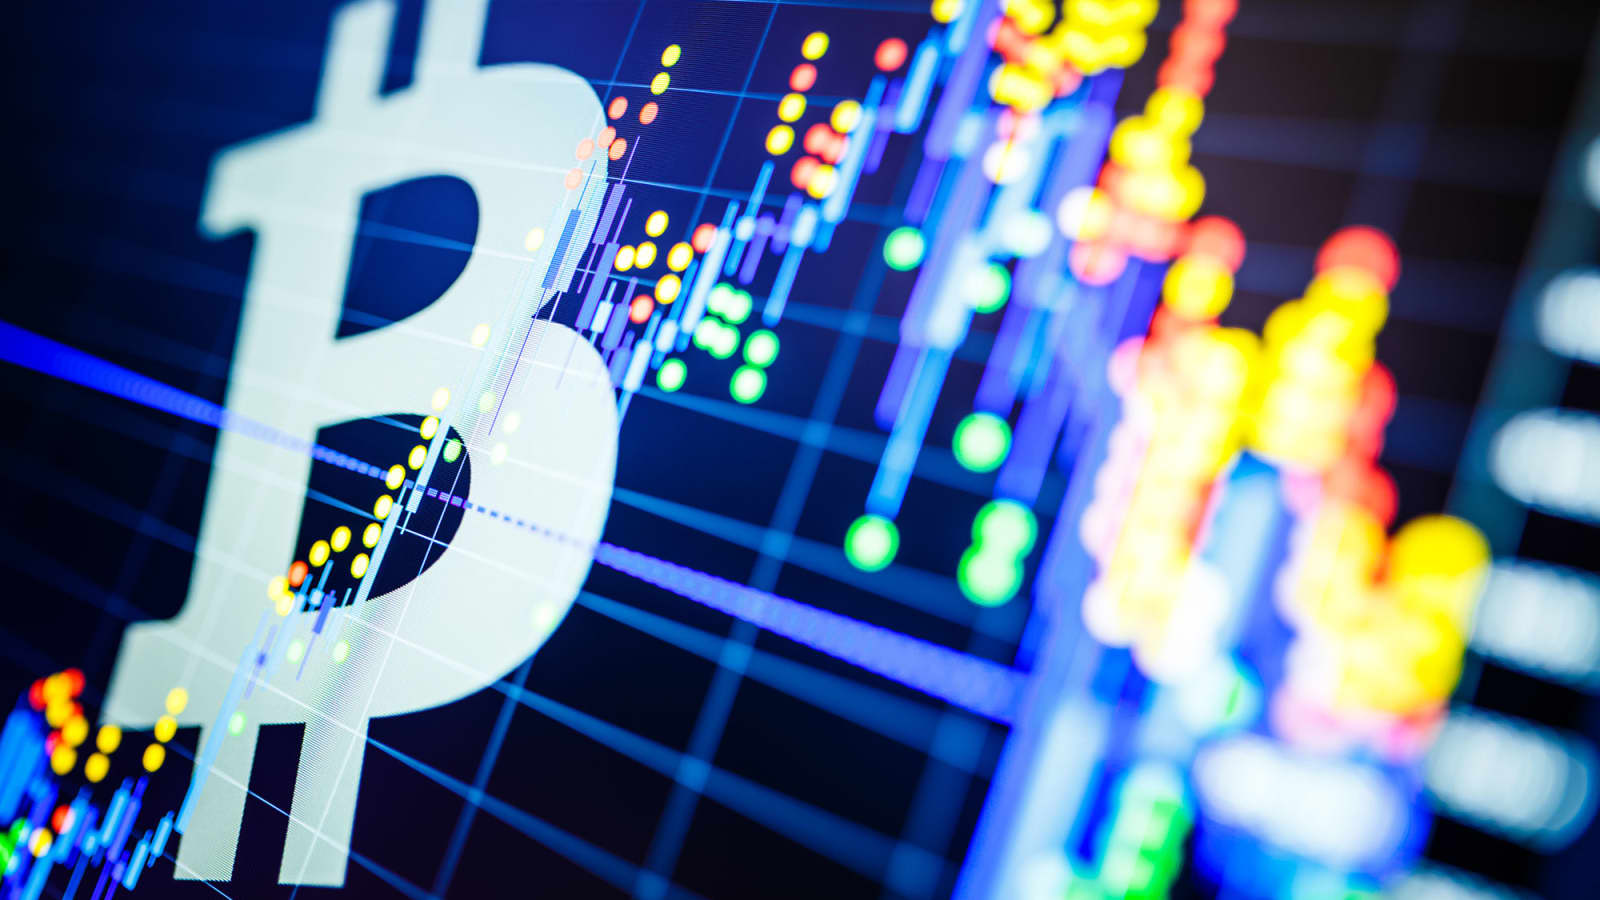 Jeffrey robinson bitcoins nfl betting lines 2021 week 2